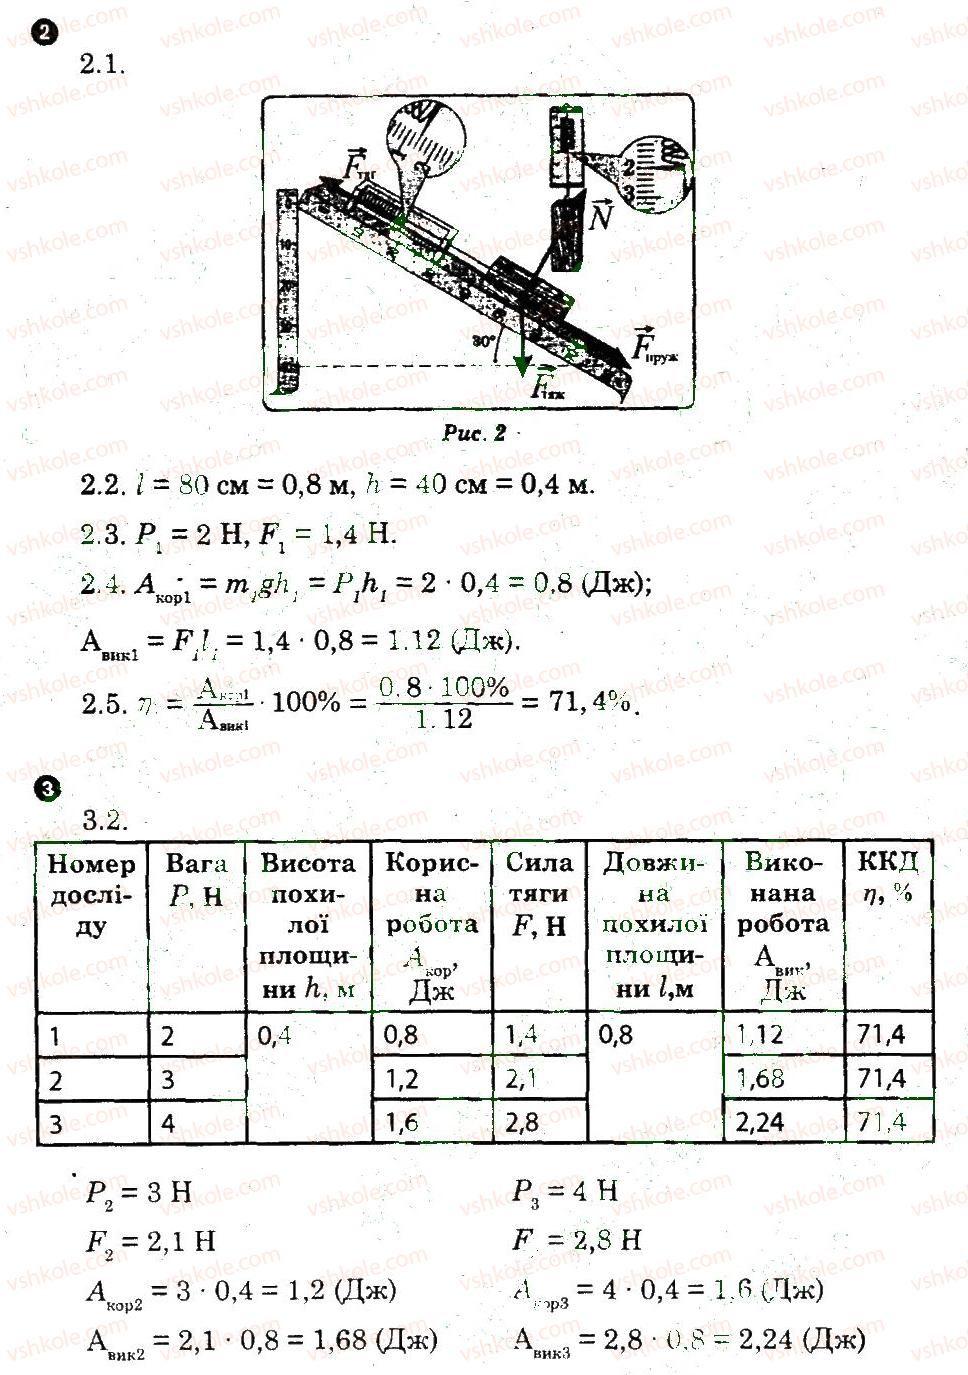 8-fizika-fya-bozhinova-oo-kiryuhina-2010-zoshit-dlya-laboratornih-robit--laboratorni-roboti-10-rnd1688.jpg